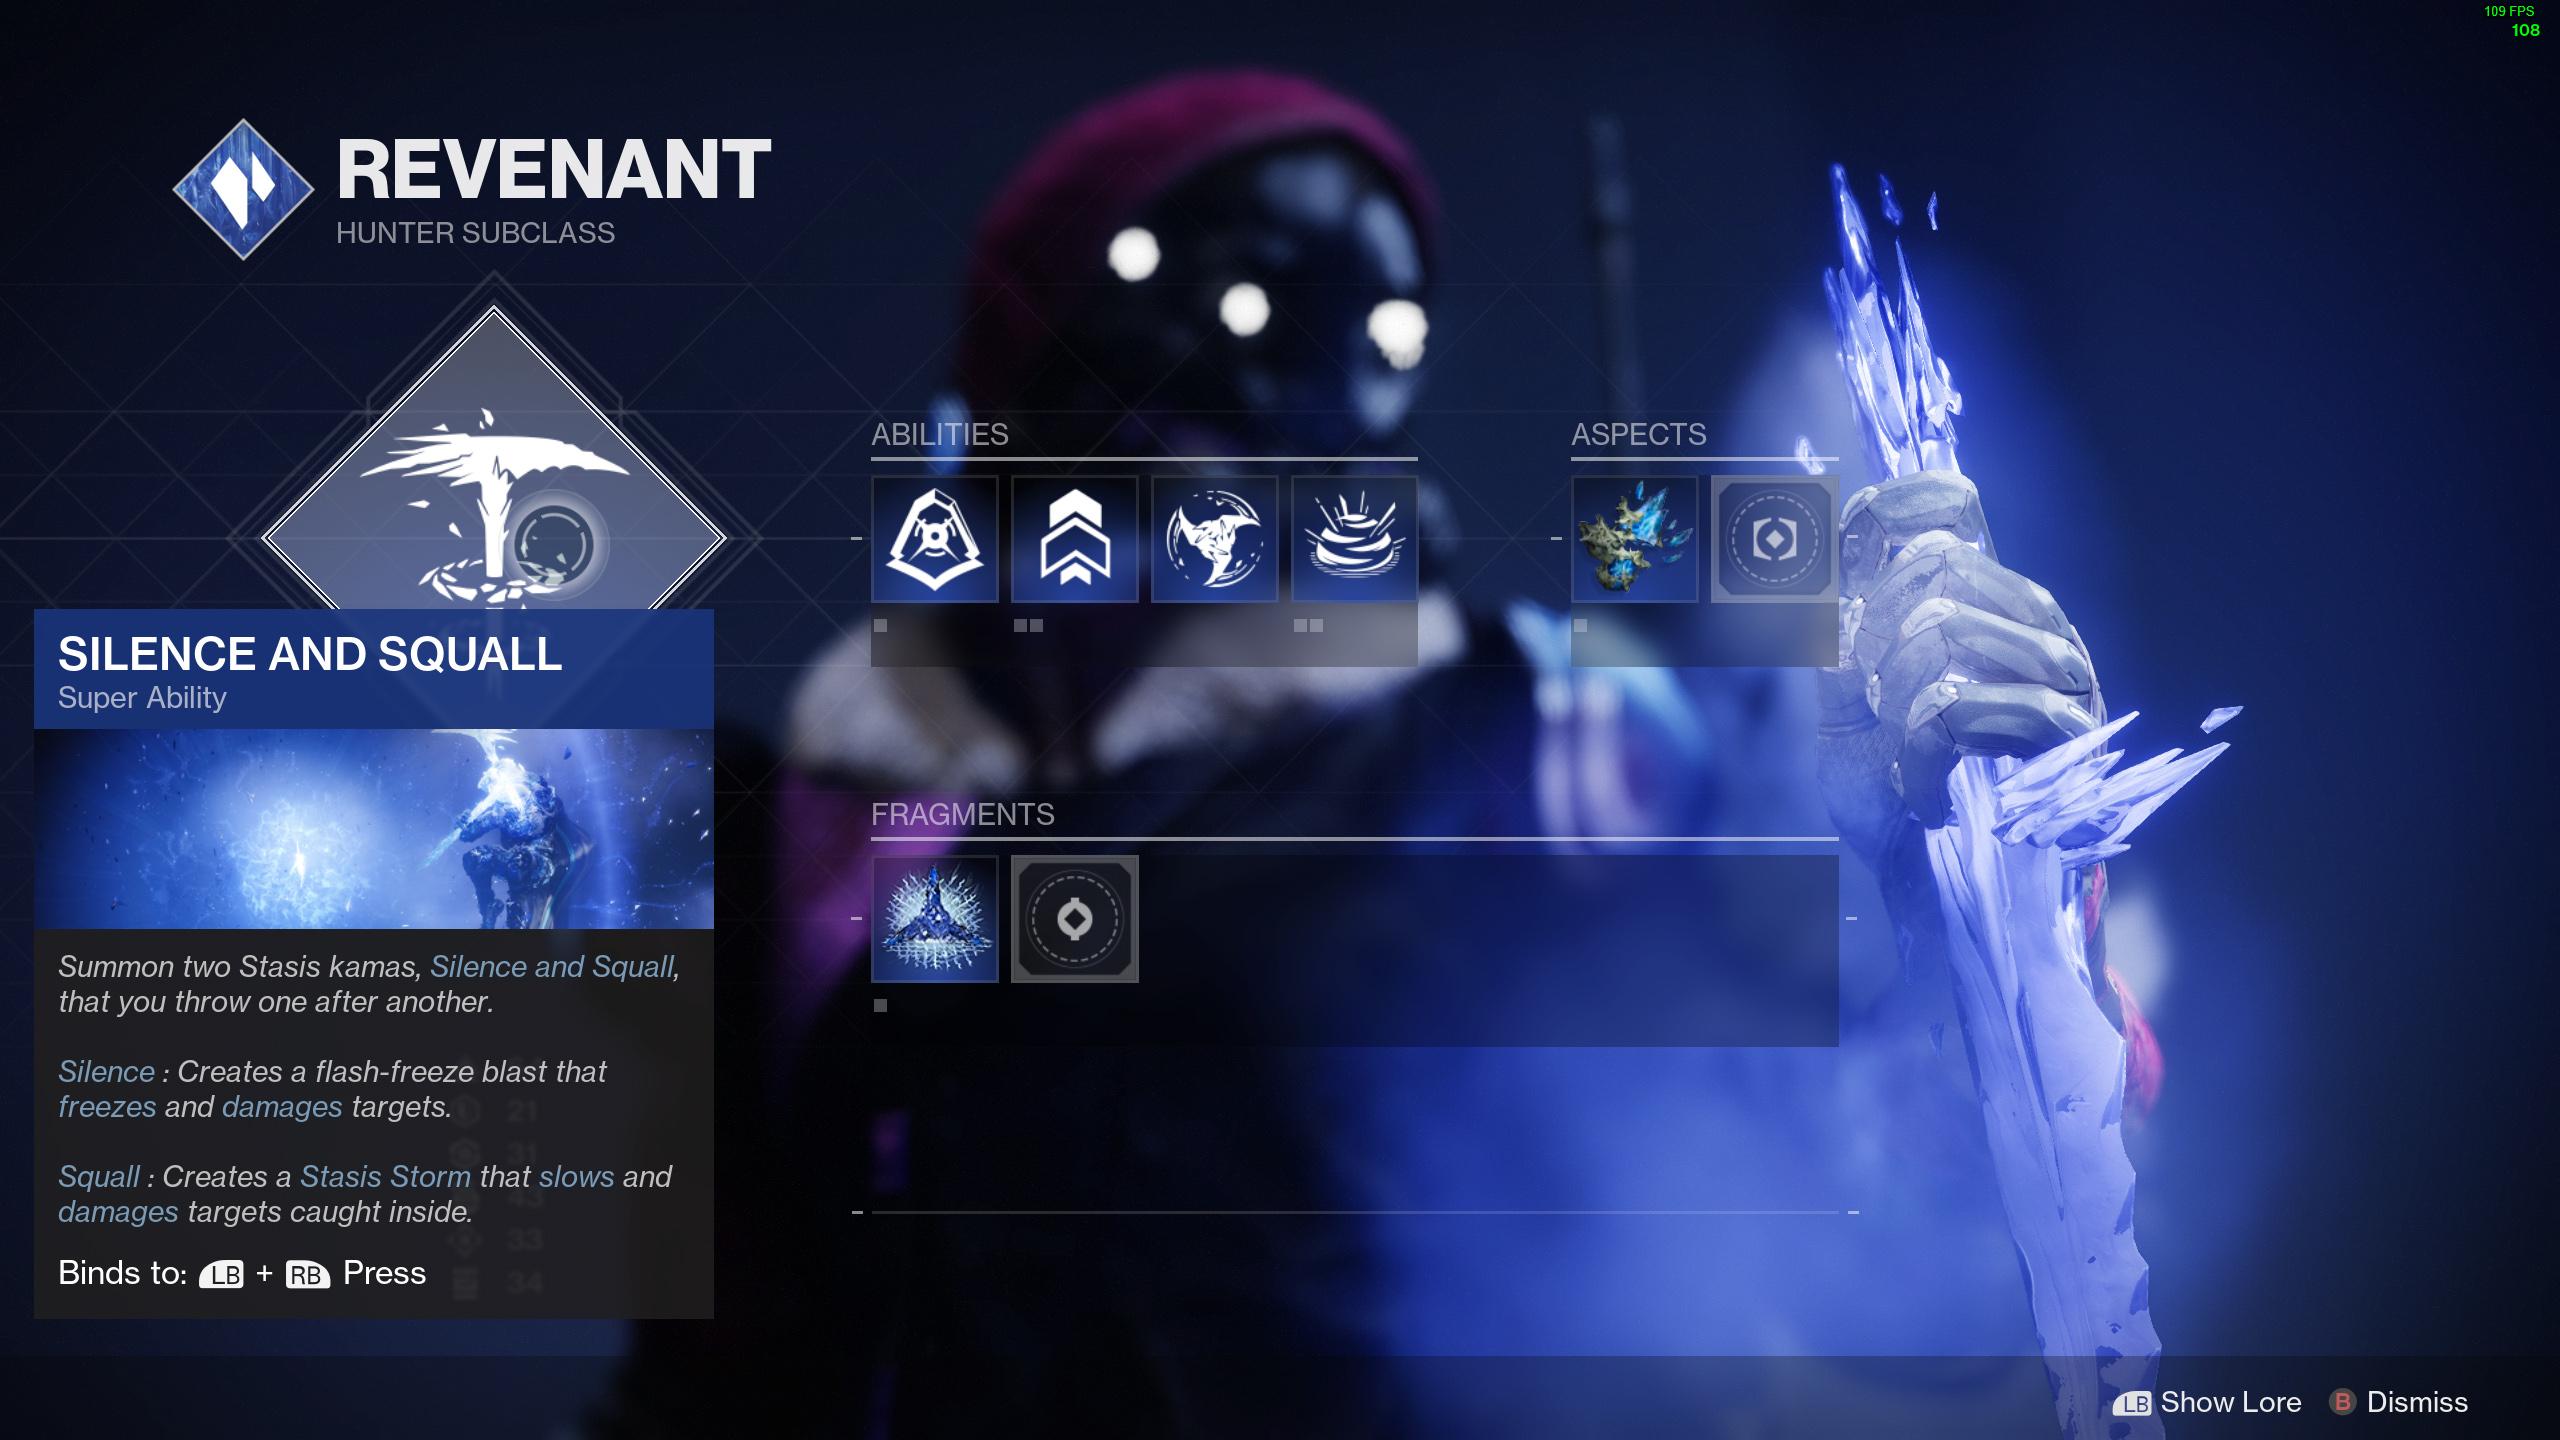 destiny 2 hunter subclass revenant